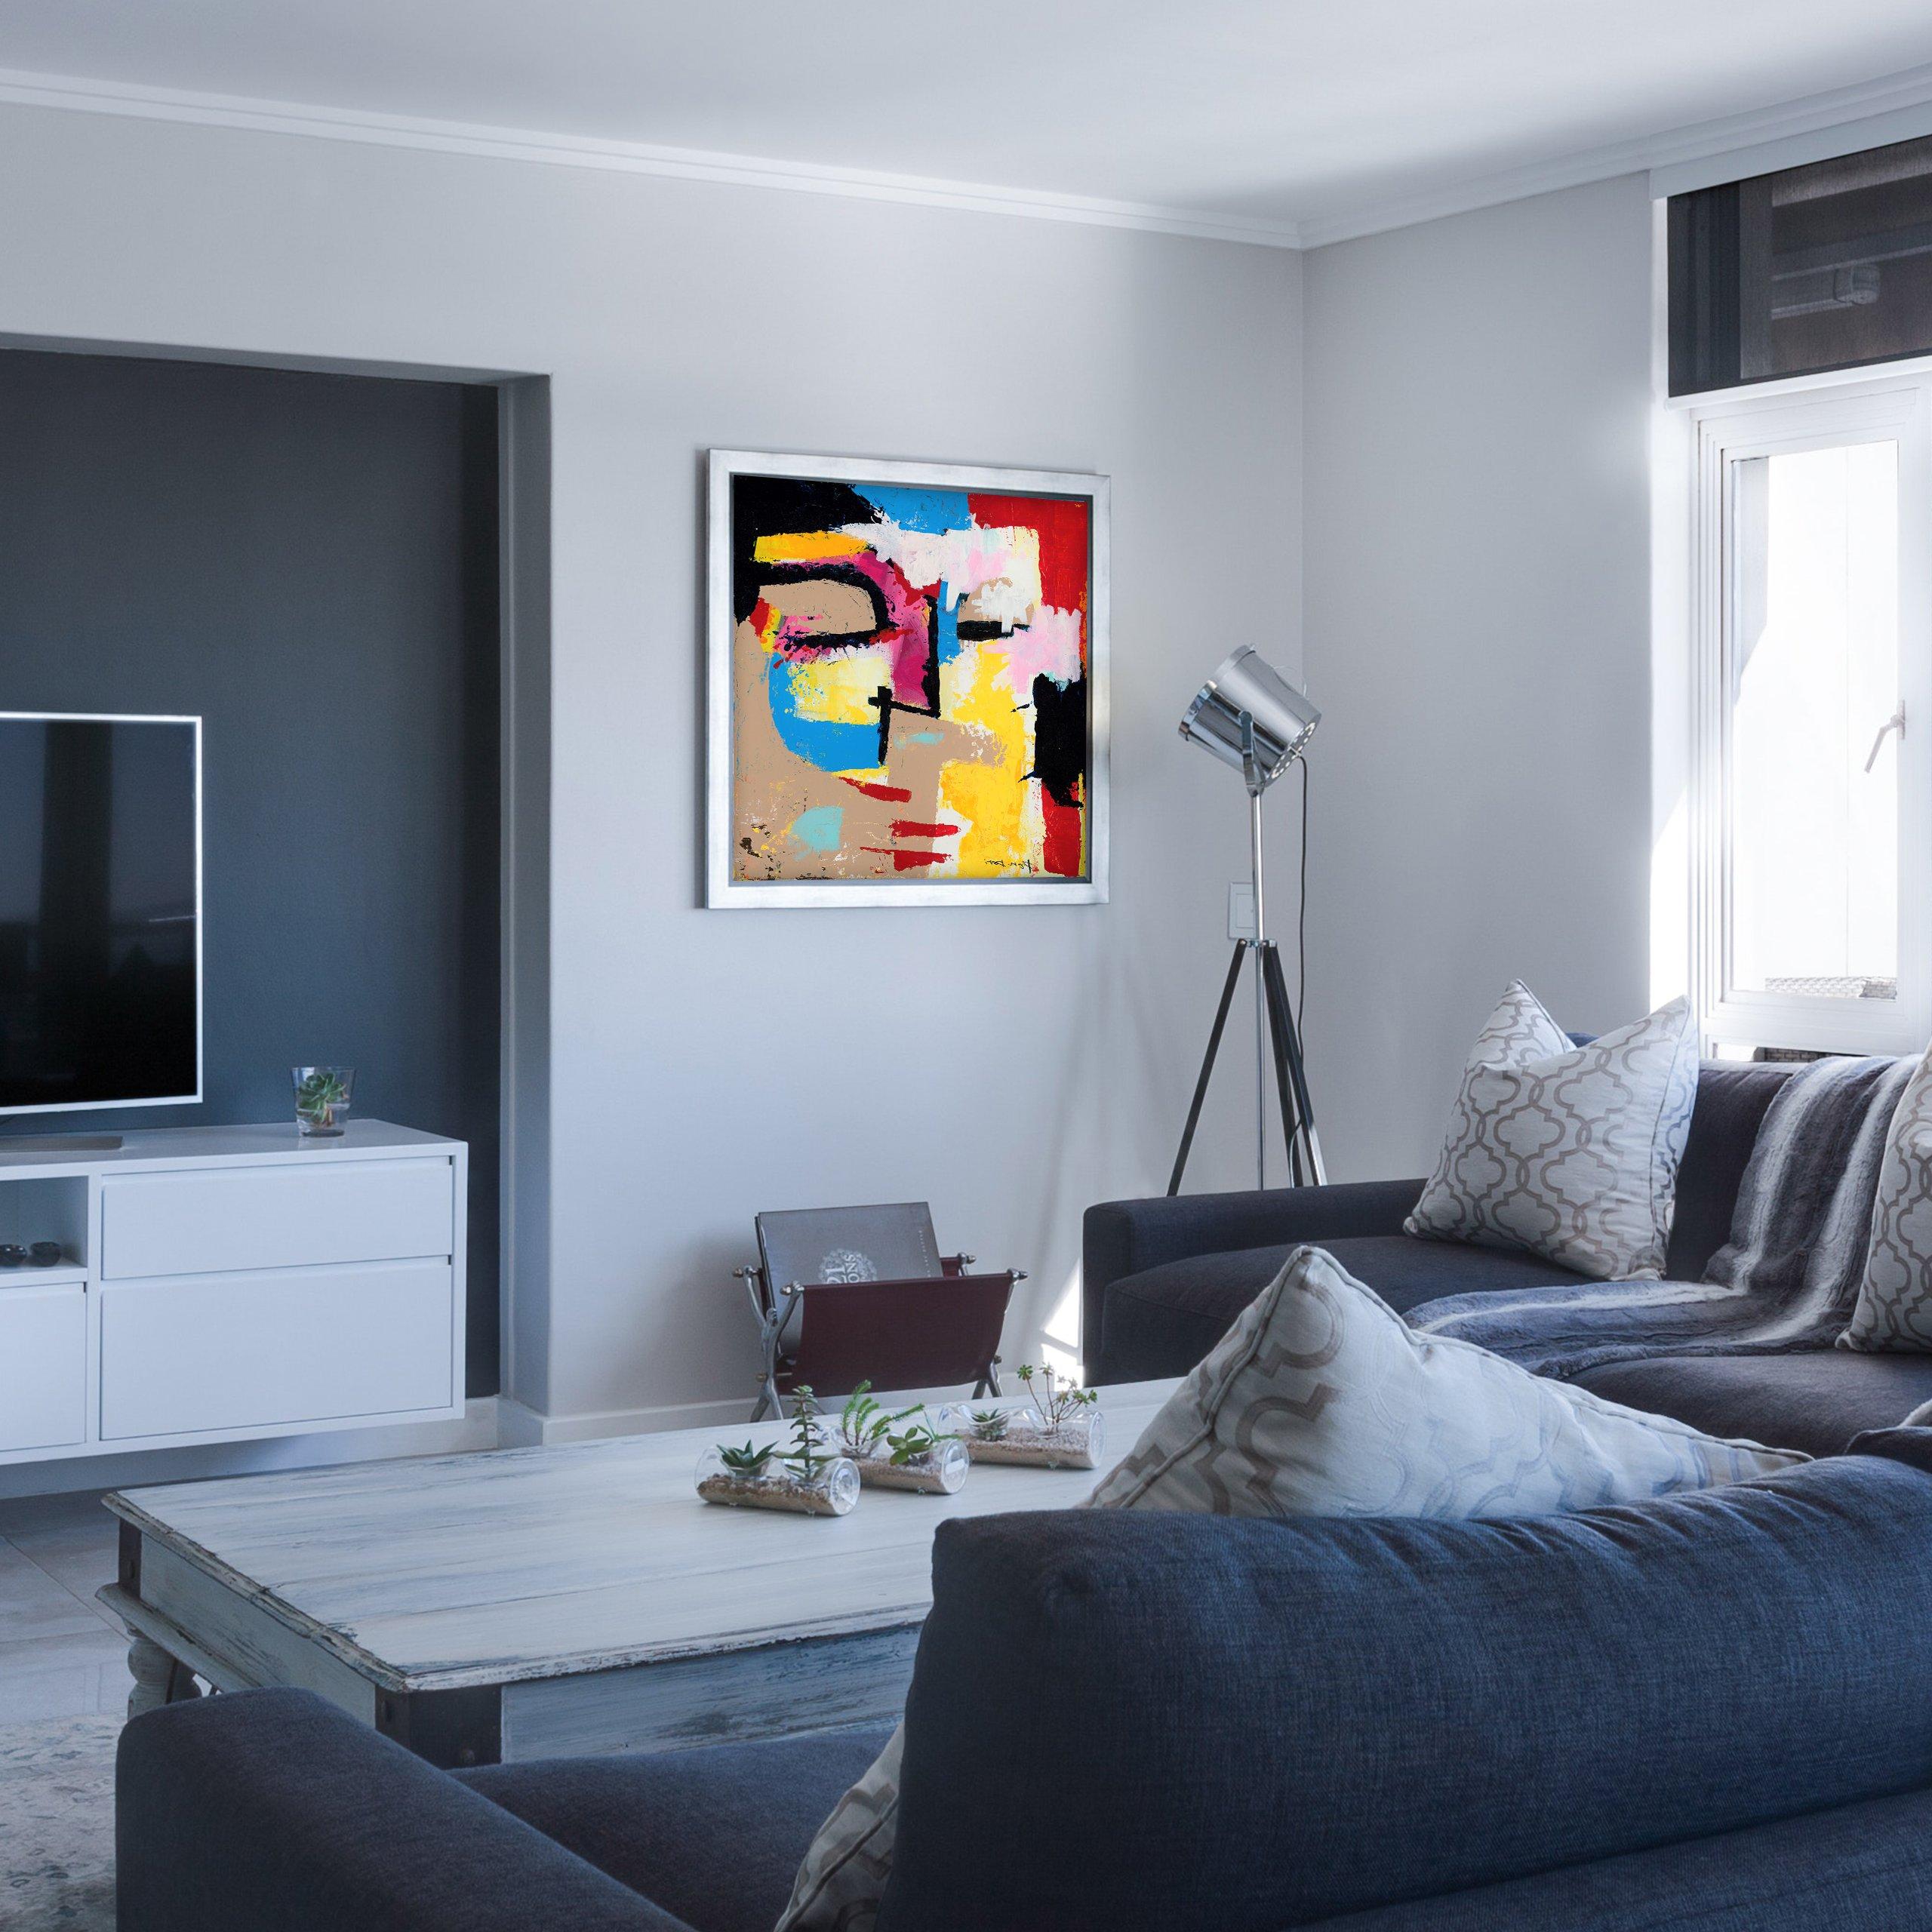 Modern abstract art in modern home decor